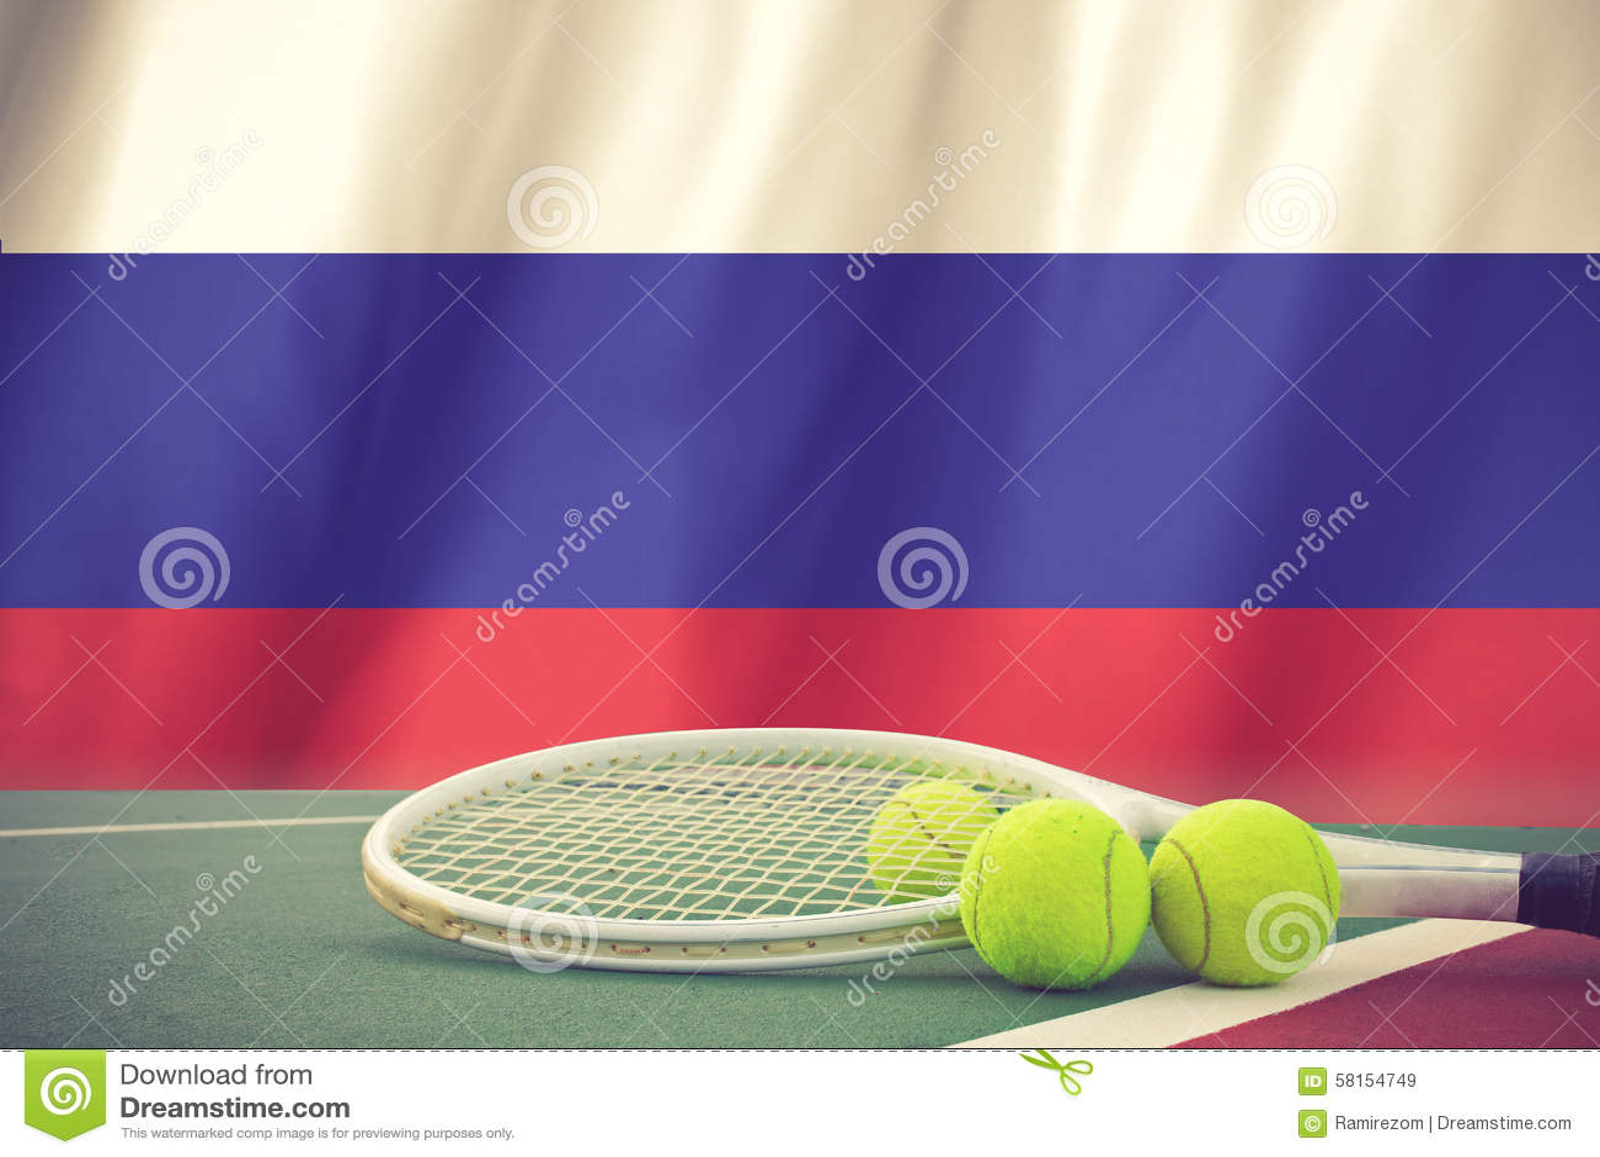 Tenis pelota stock de ilustracion ilustracion libre de stock de - Bandera De Rusia Y Pelota De Tenis